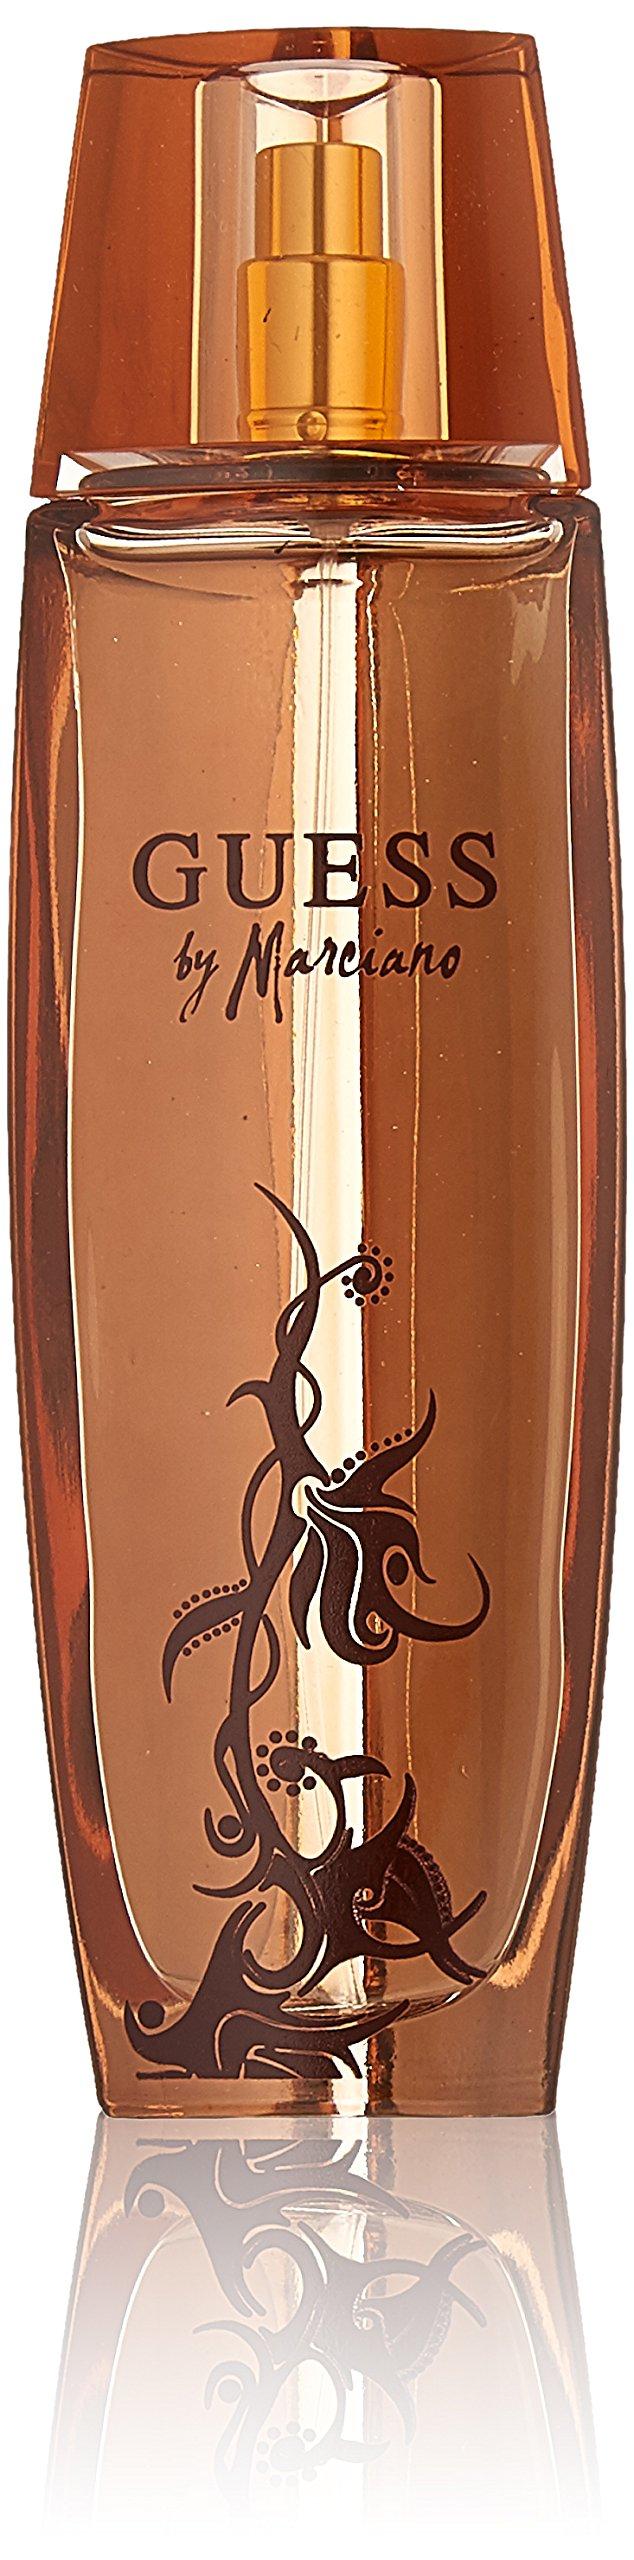 Guess Marciano Eau de Parfum Spray for Women, 3.4 Fluid Ounce by GUESS